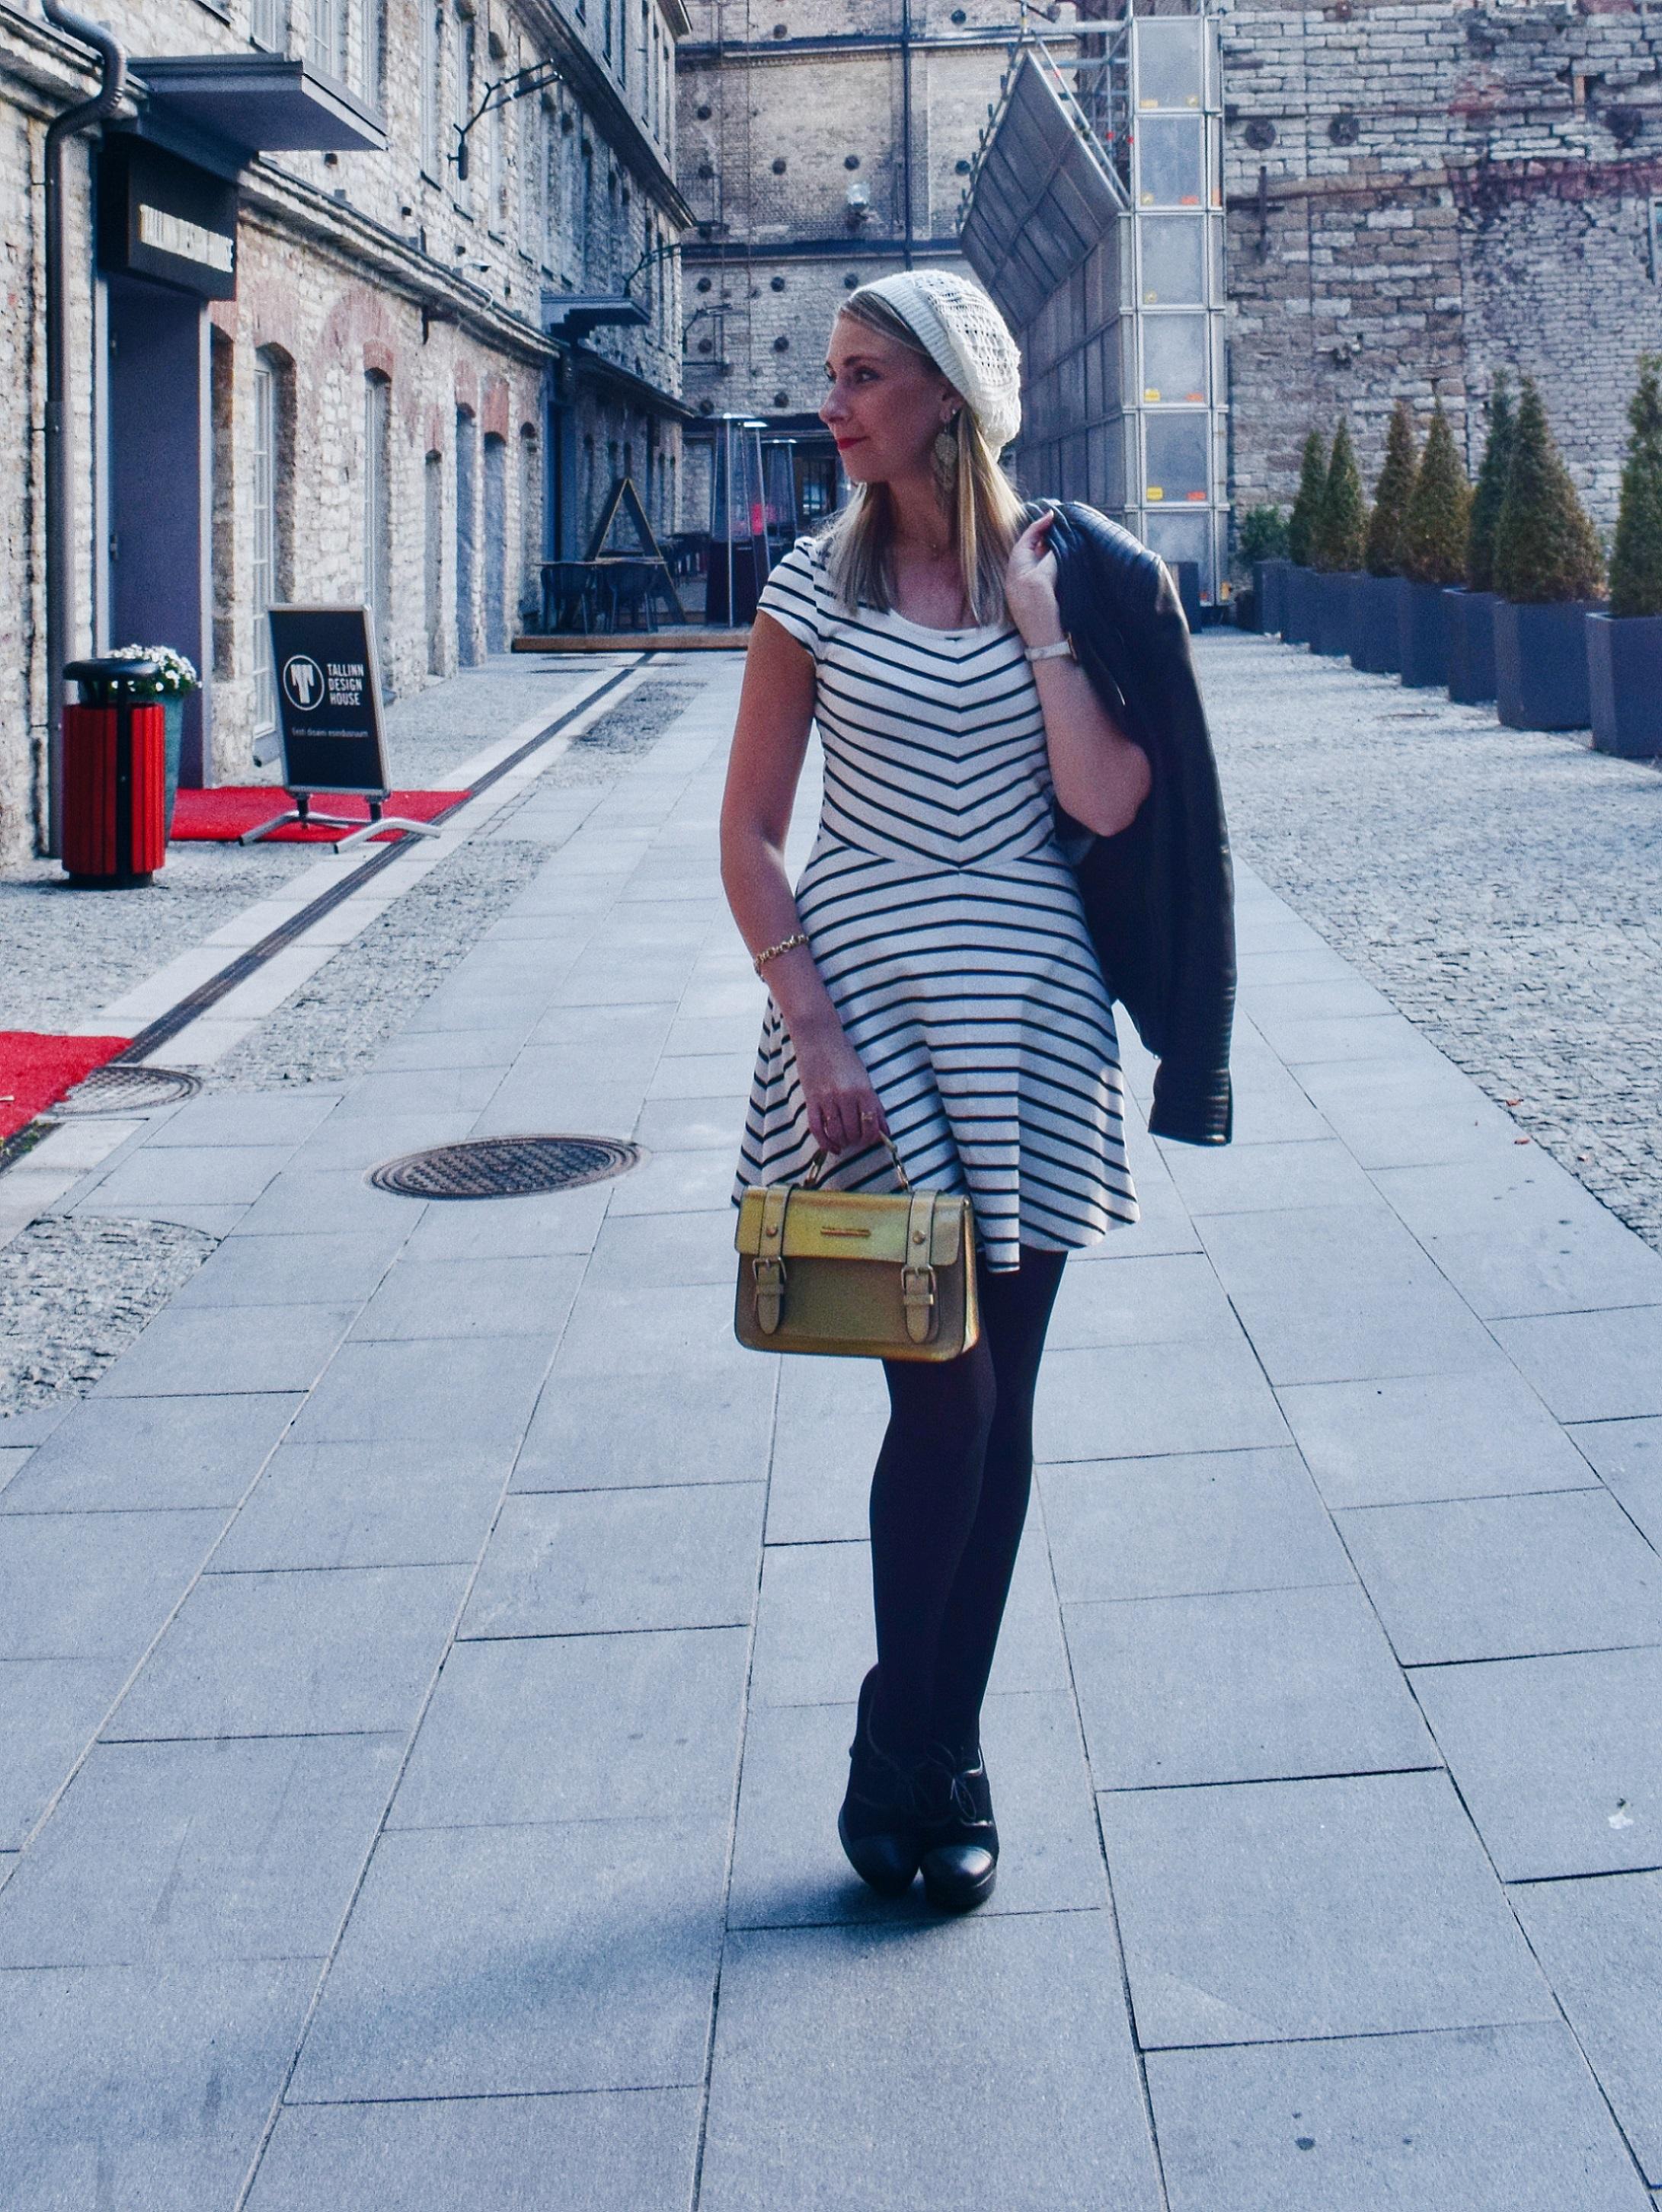 Outlandish blog make friends adult relationships advice Autumn outfit dress high heels hat